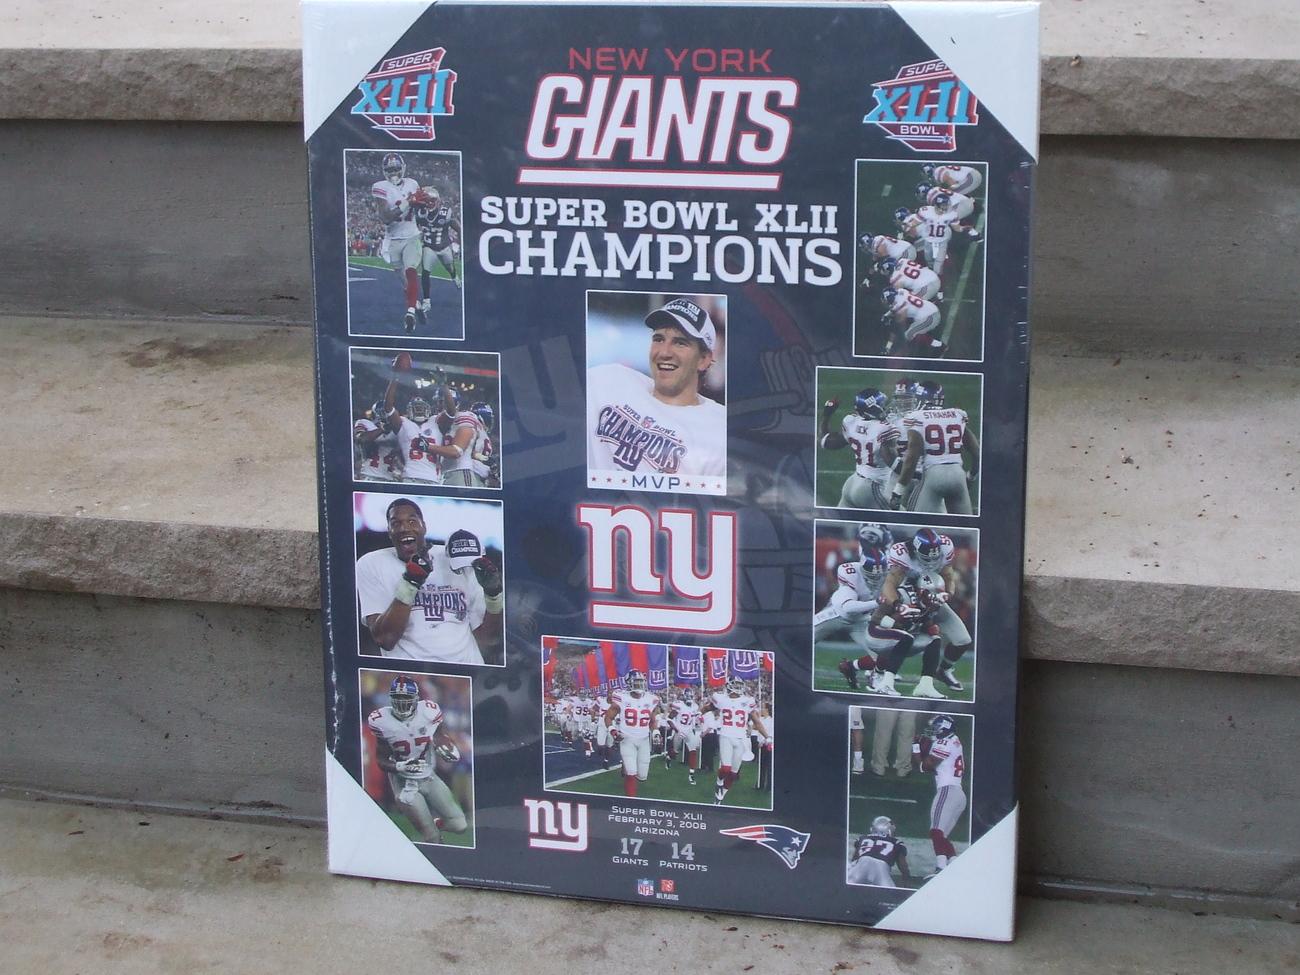 Giants super bowl